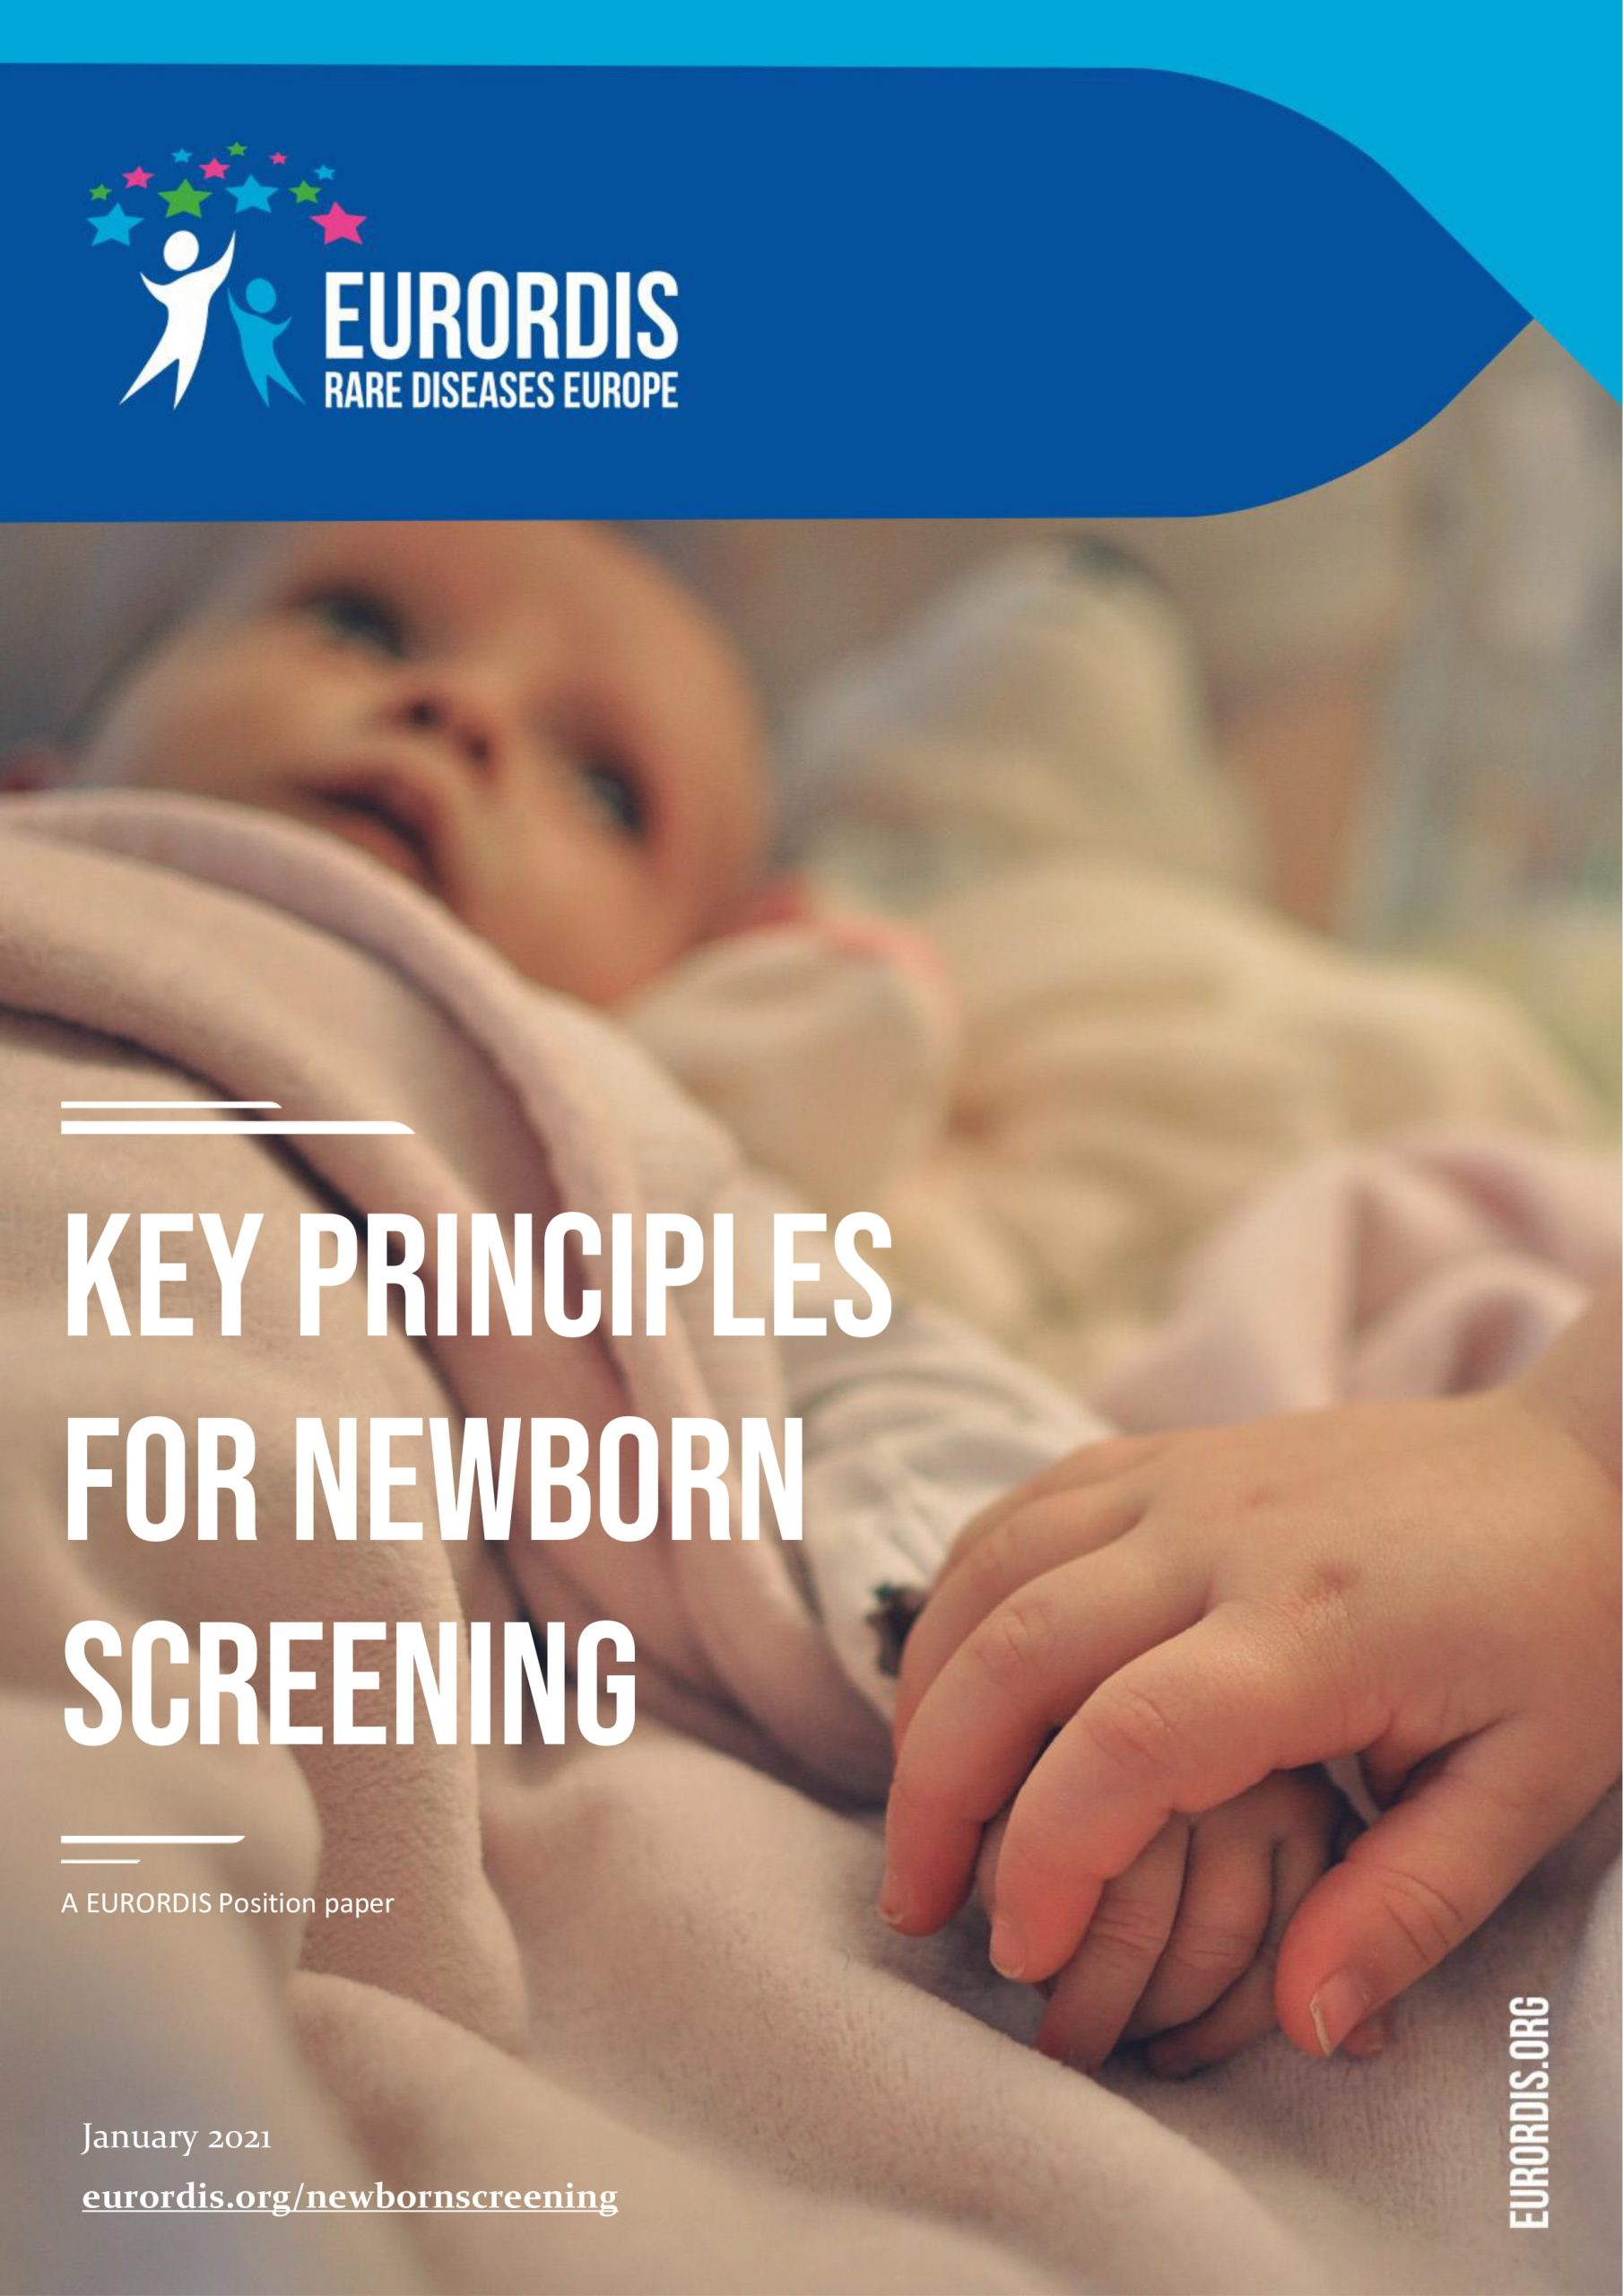 eurordis_Key-principles-for-newborn-screening-scaled Sleutelprincipes voor screening van pasgeborenen